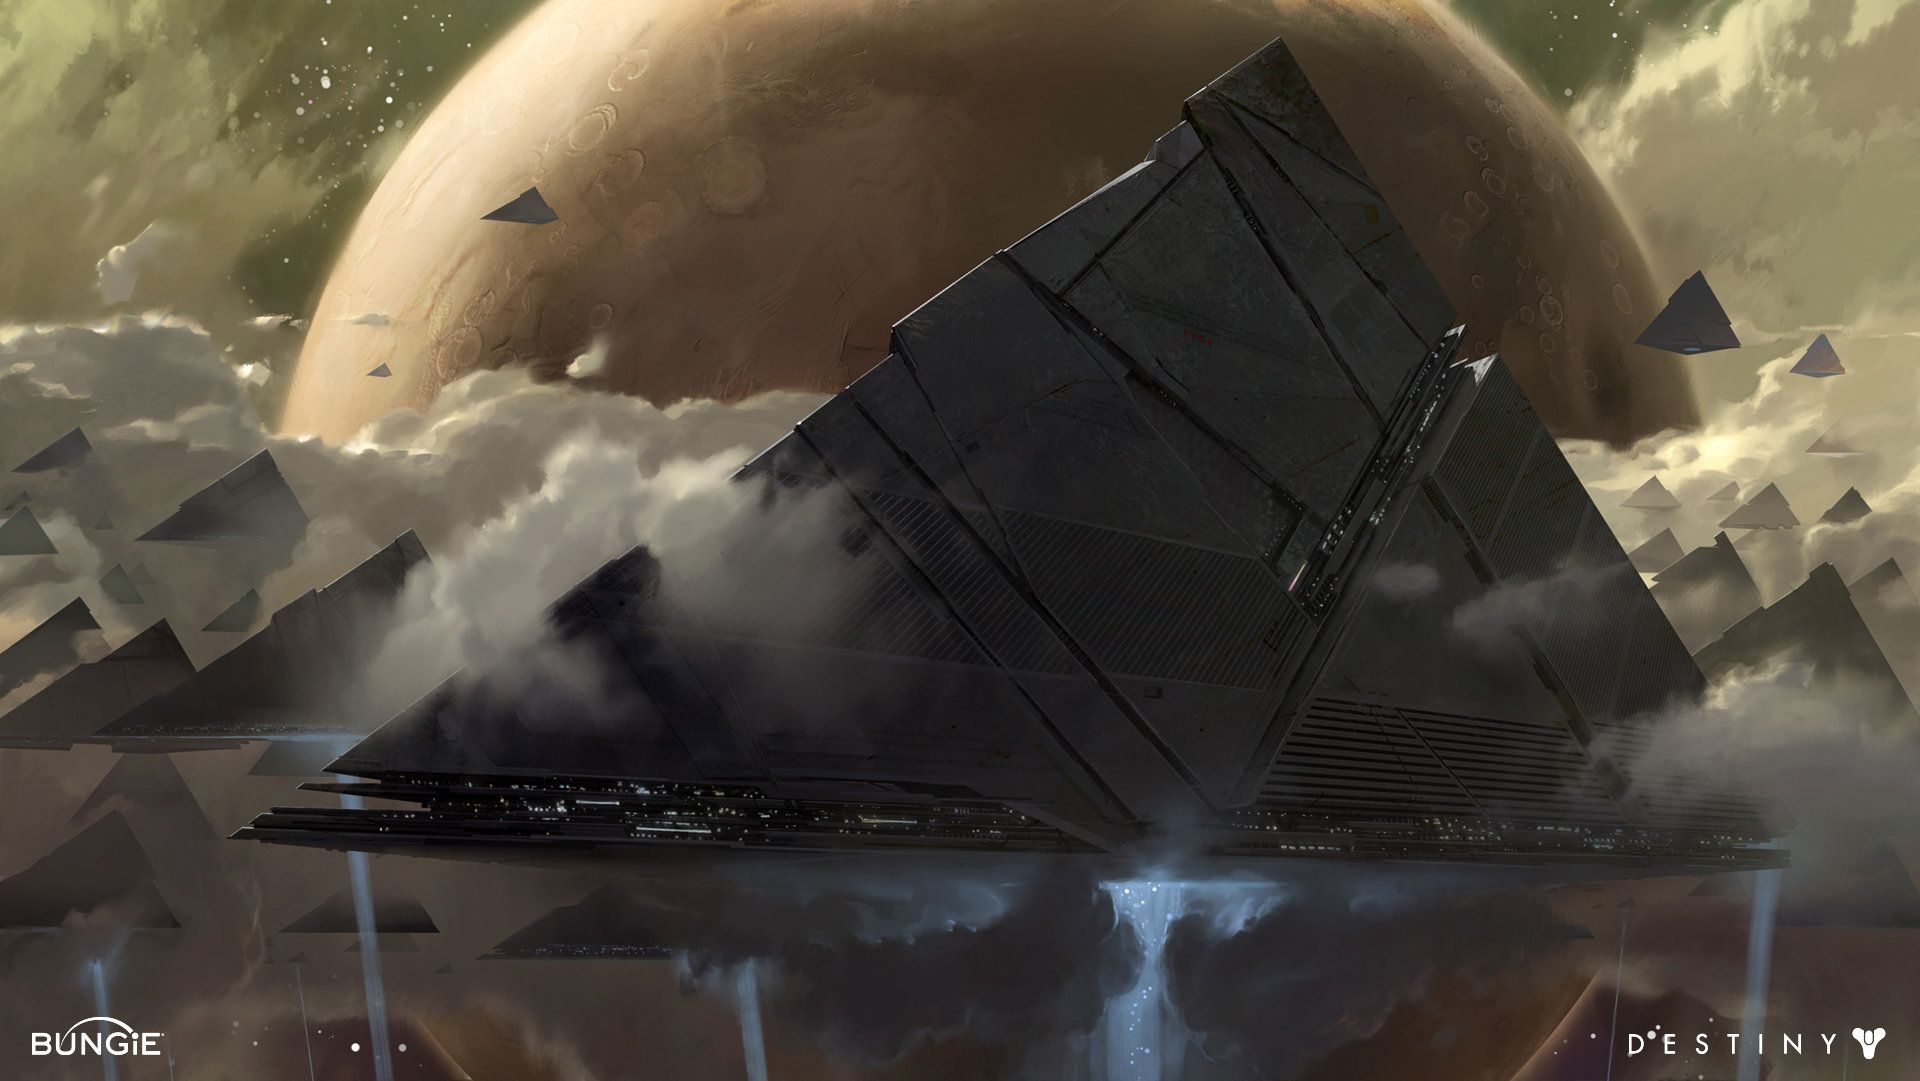 Artstation Destiny Pyramid Ships Dorje Bellbrook Concept Art World Concept Art Destiny 2 Shadowkeep